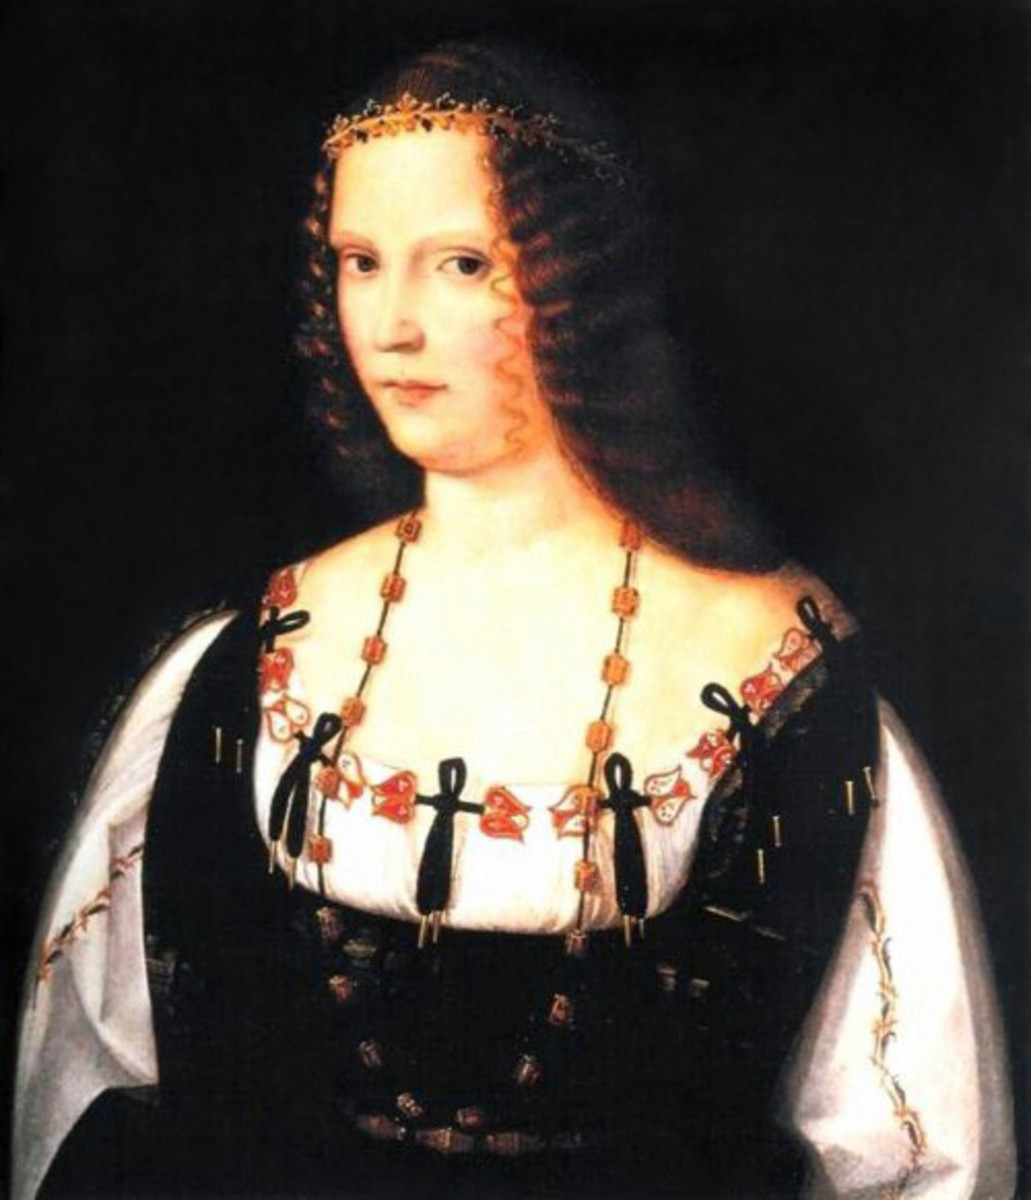 Bartolomeo Veneto, Presumed Portrait of Lucrezia Borgia (1506 - 1508), London National Gallery